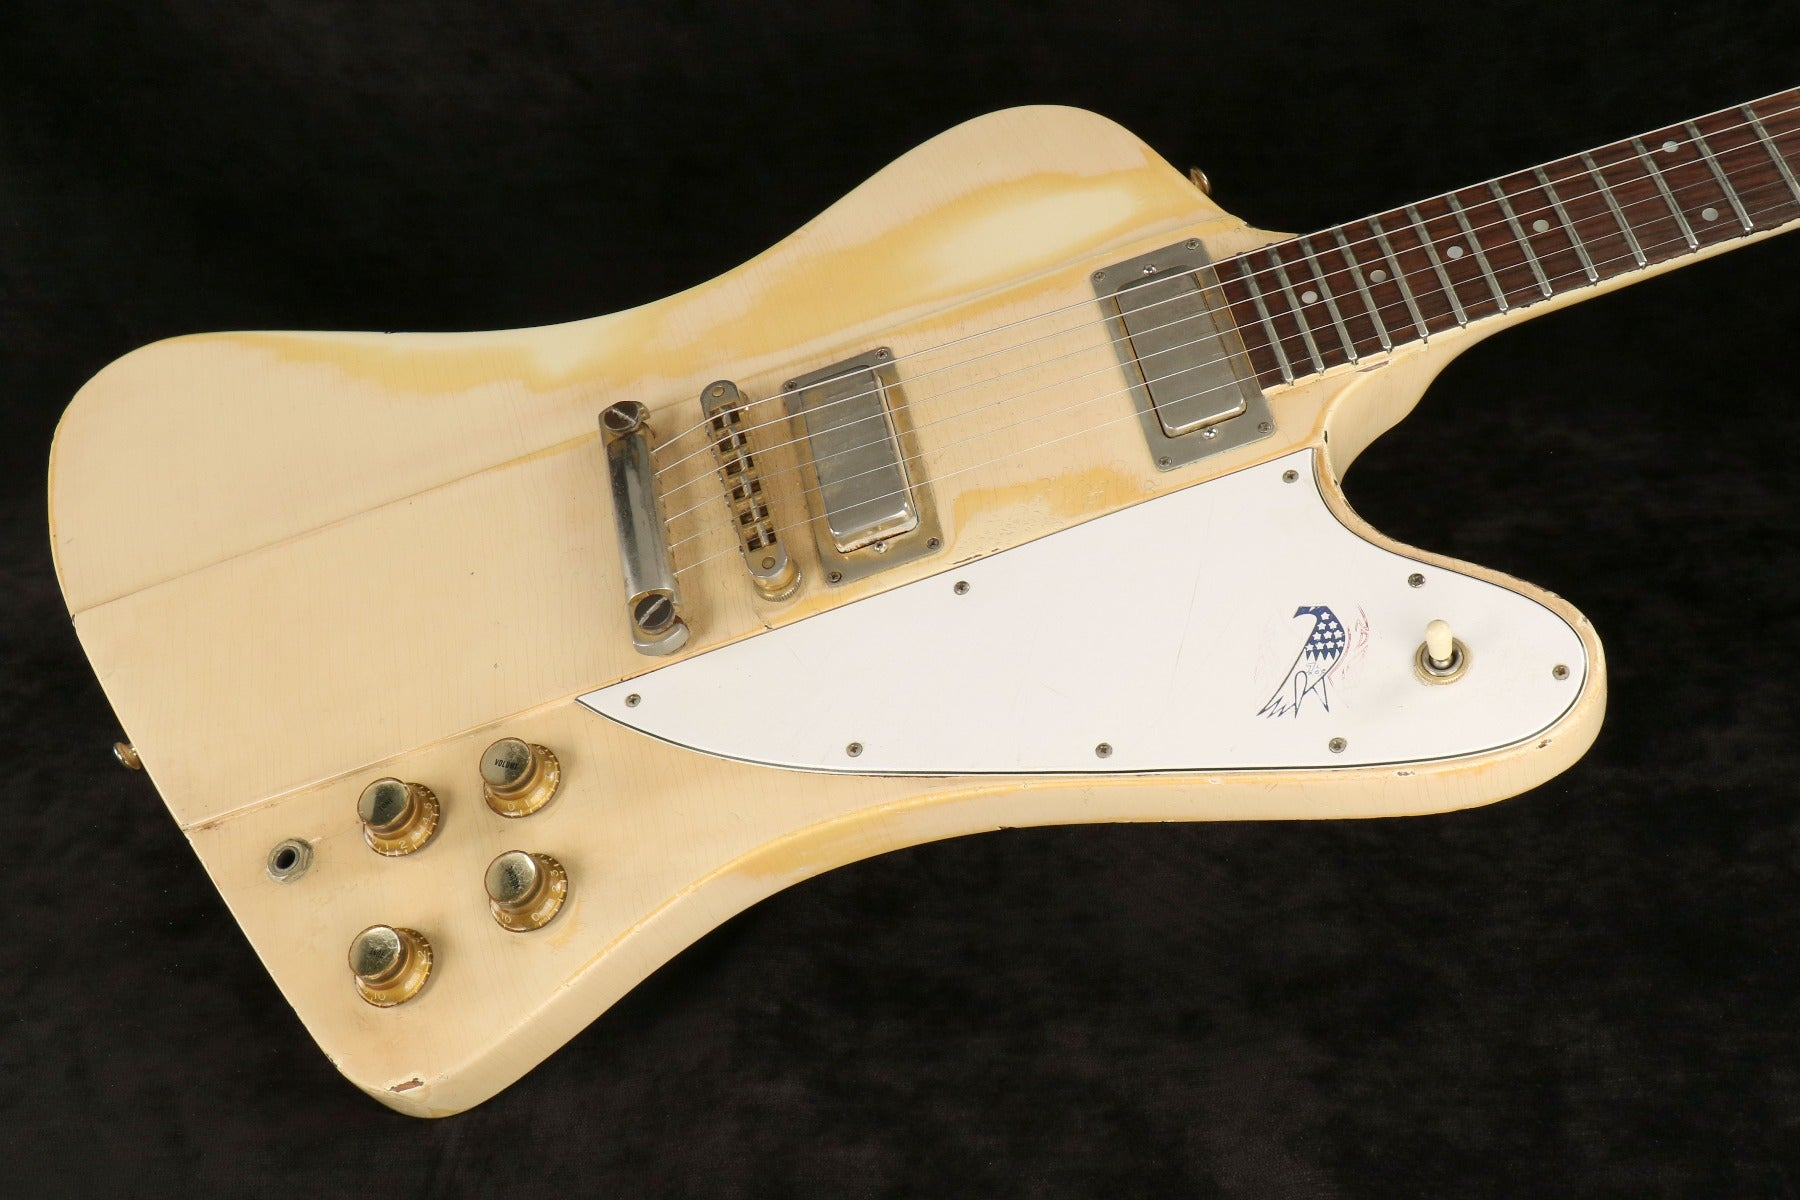 Gibson Special Edition Bicentennial '76 Firebird in Polaris with Red, White, Blue Firebird Icon